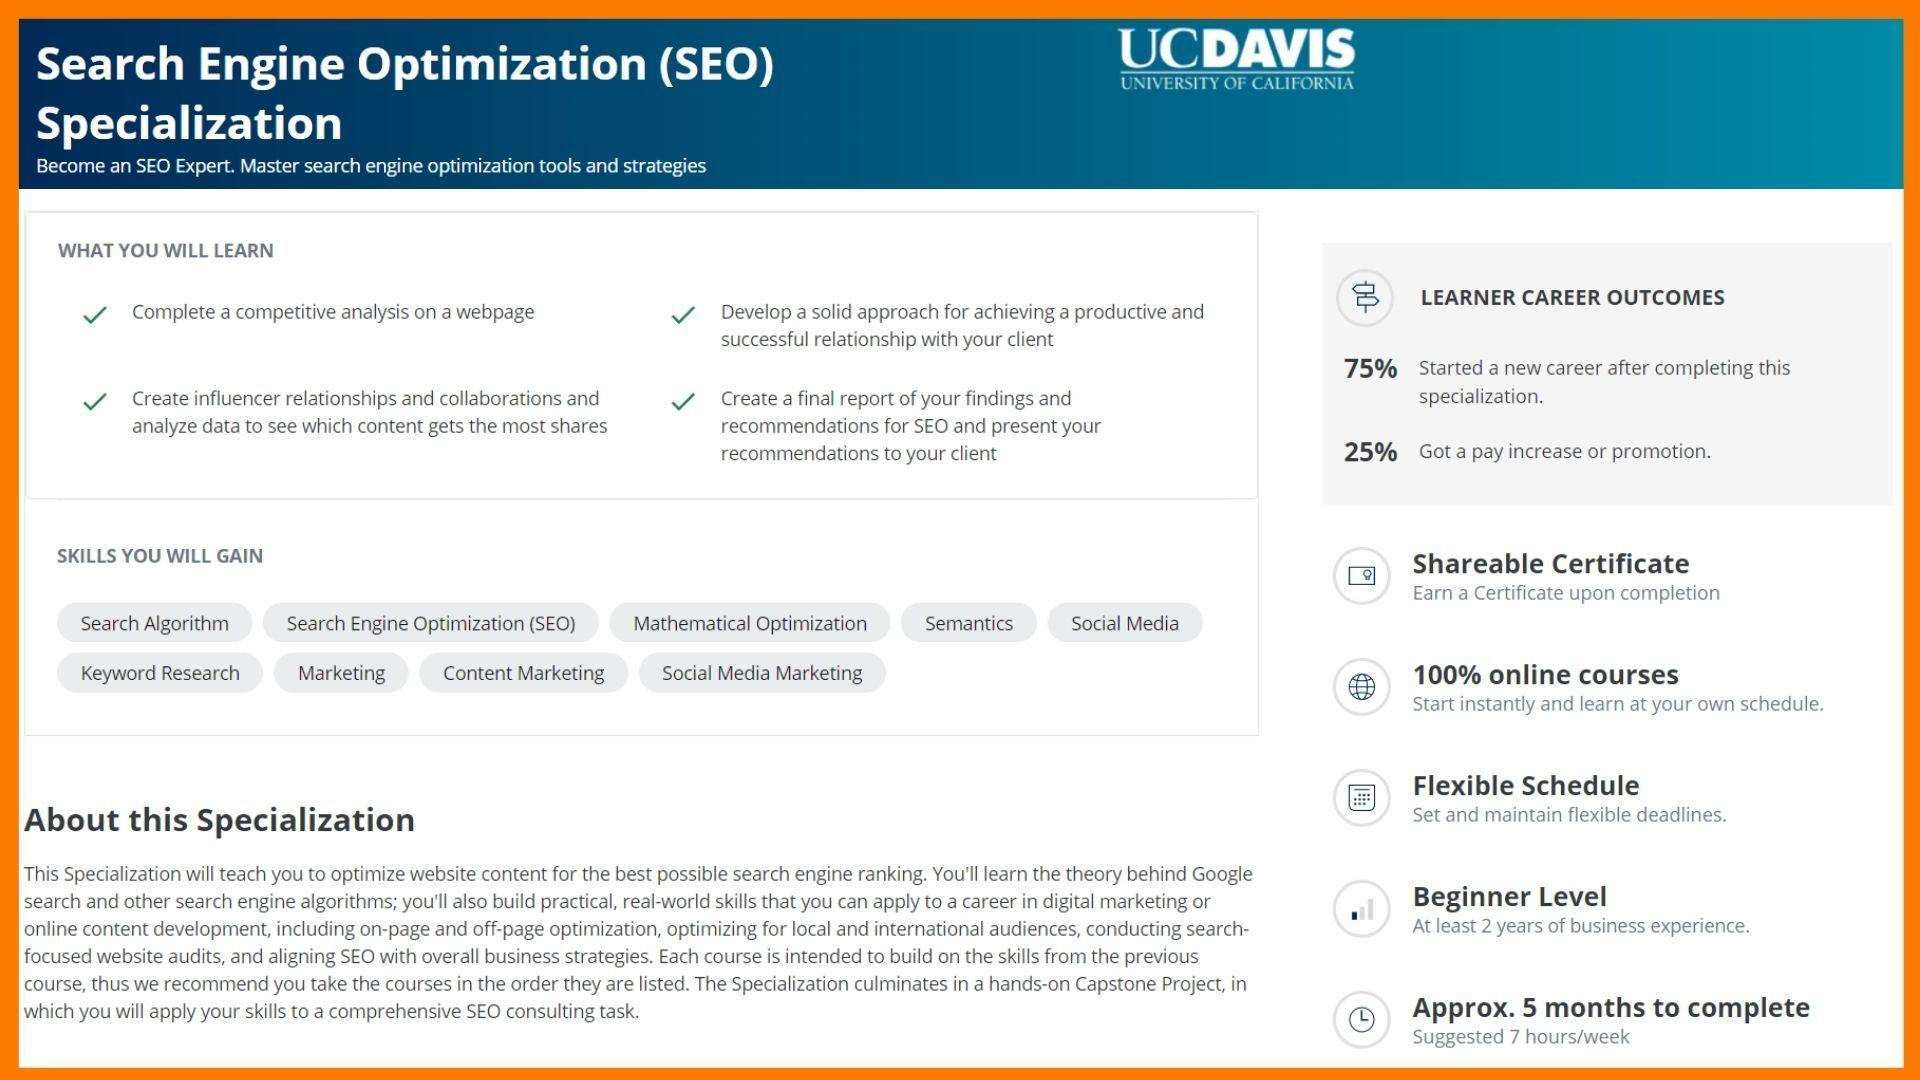 Search Engine Optimization (SEO) Specialization